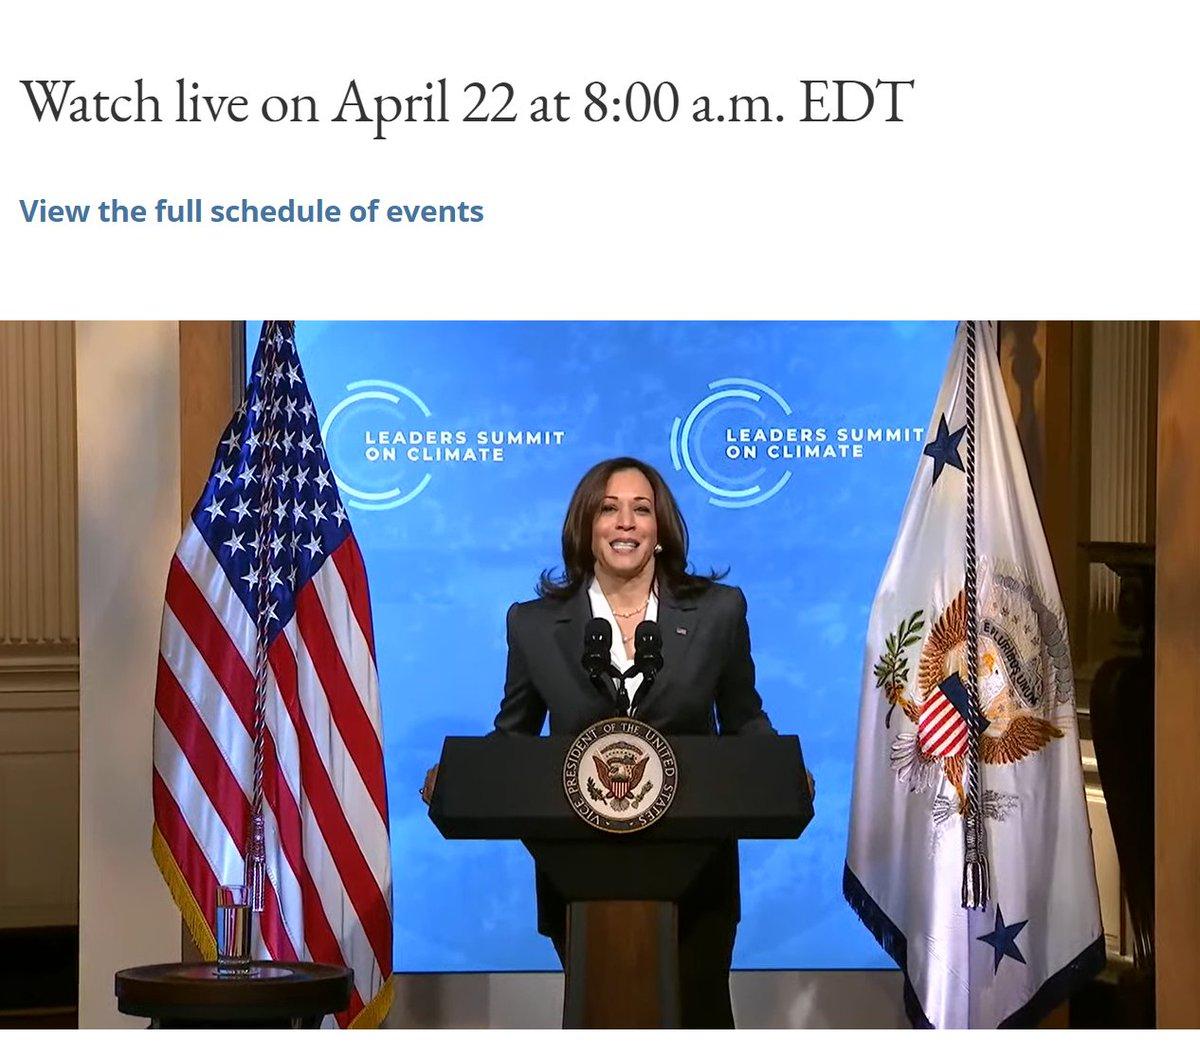 VP Harris opens (with weird echo in the live feed) Damn still echo with Pres Biden?